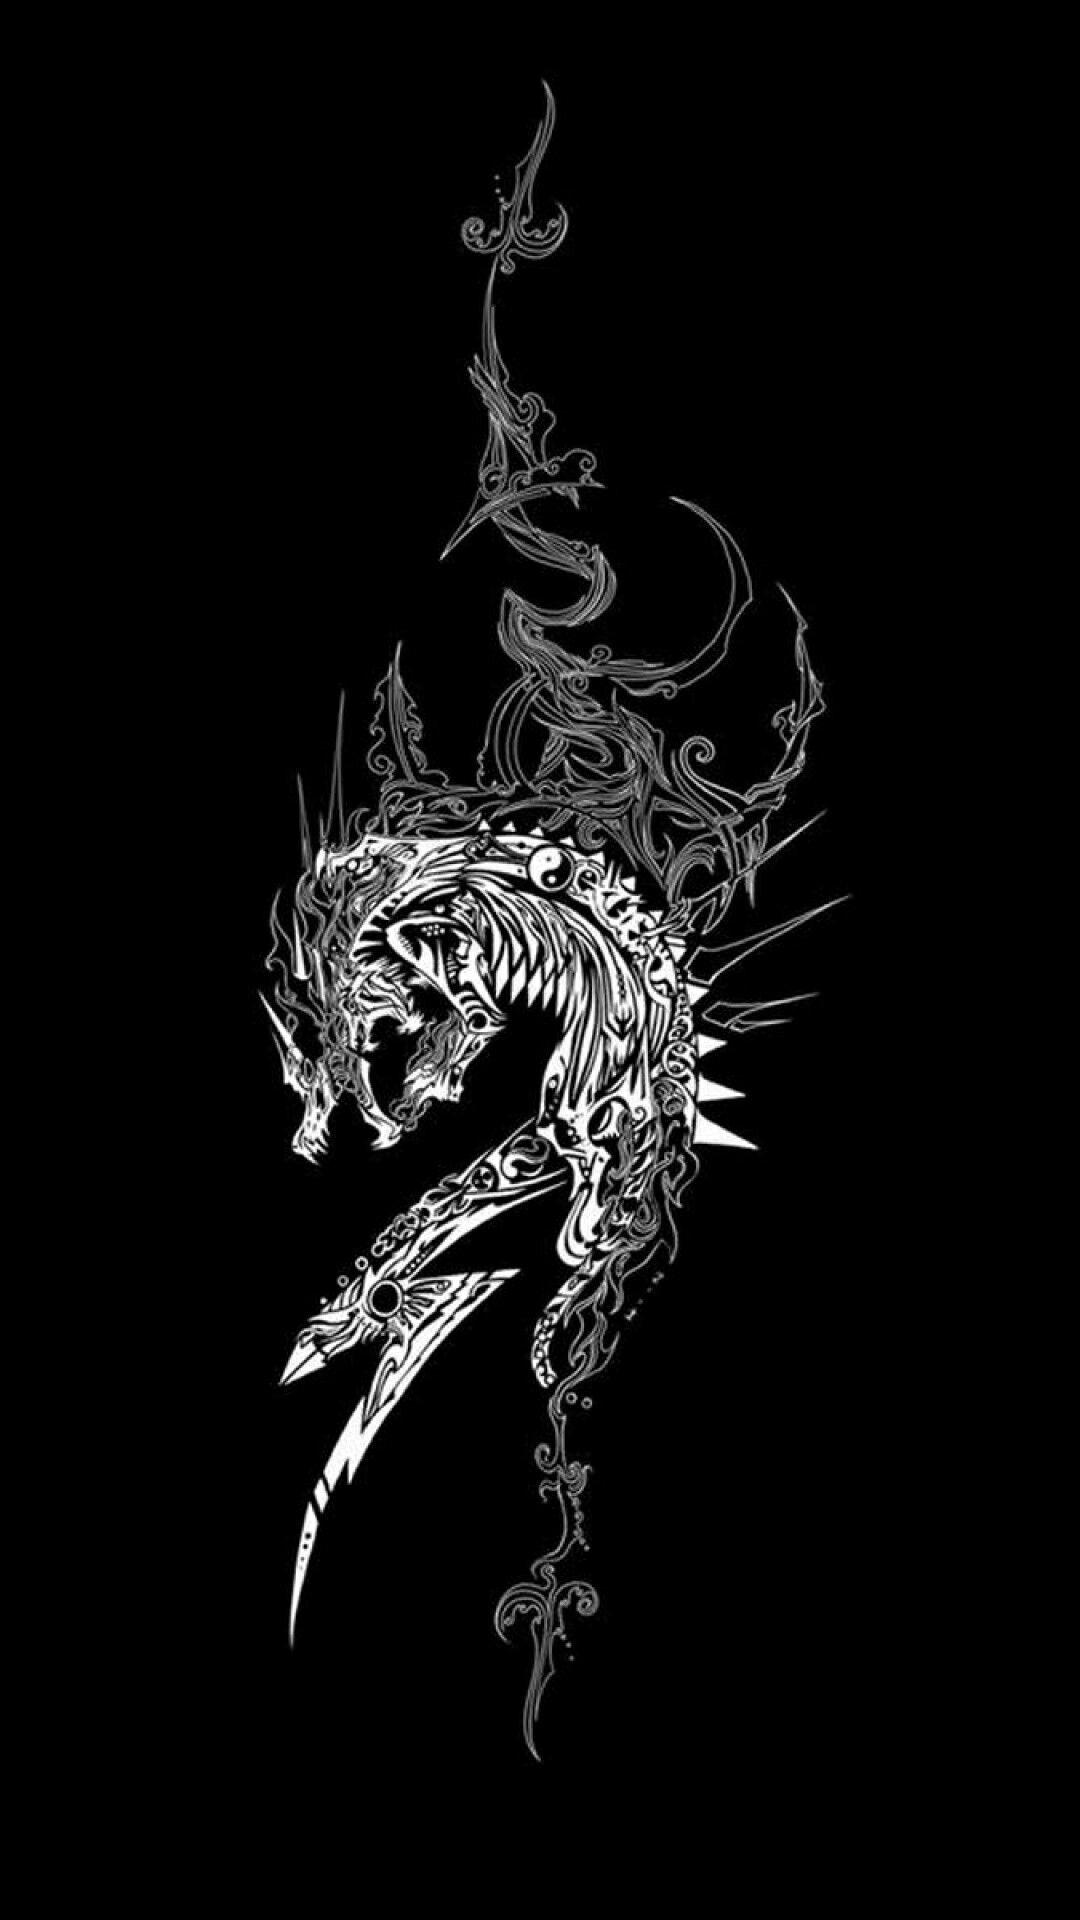 71 Oni Mask Wallpapers on WallpaperPlay